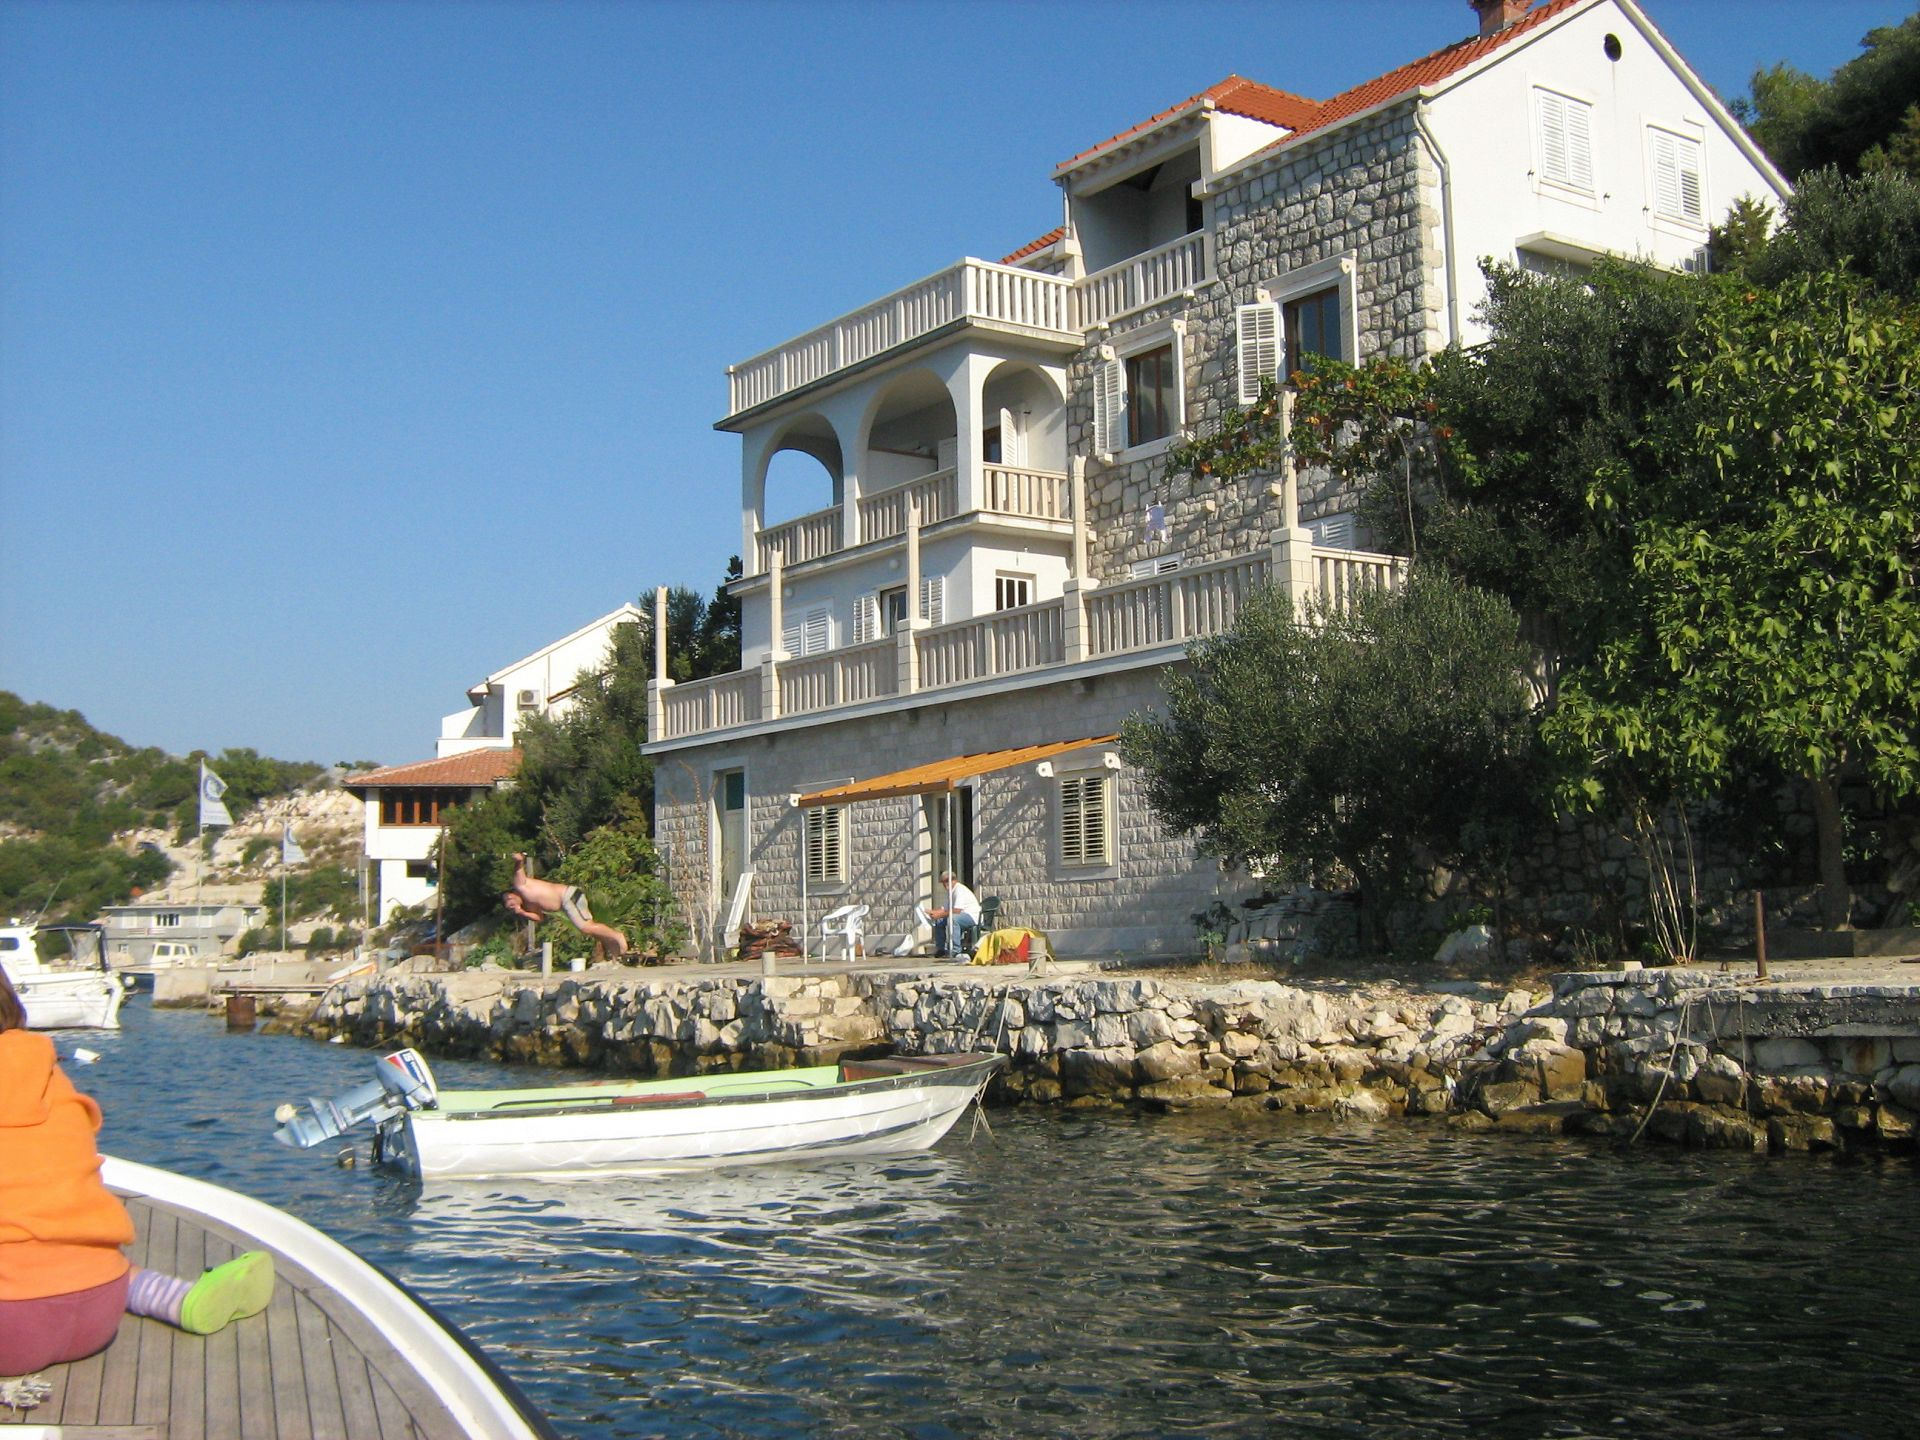 Apartman Apartment Mile  - untouched nature & serenity: A6 President Zaklopatica, Island Lastovo 52306, Zaklopatica, Lastovo, Dubrovacko-neretvanska